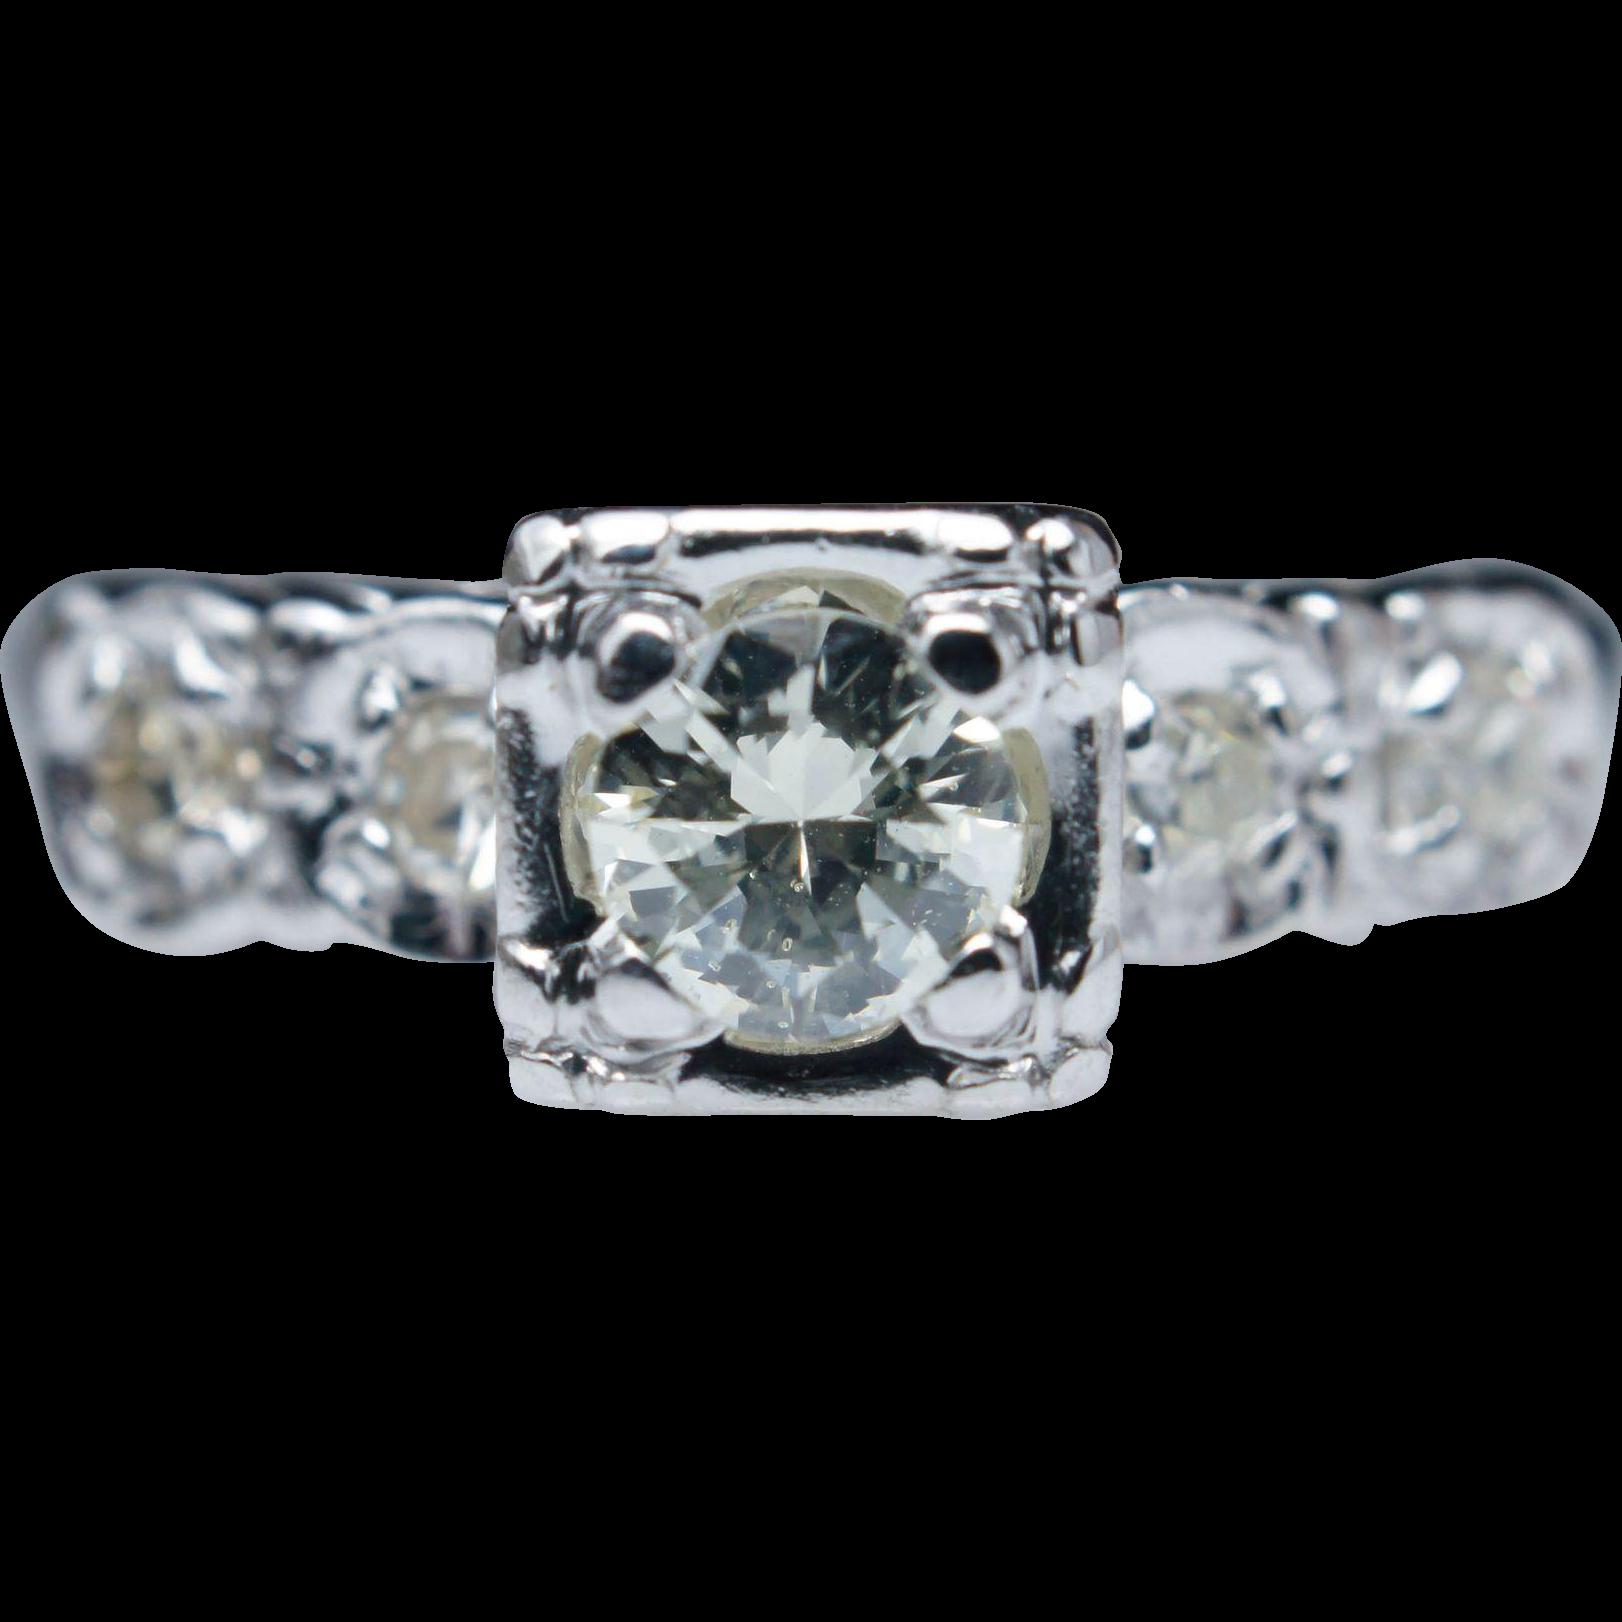 Art Deco Illusion Set Diamond Engagement Ring 14k White Gold